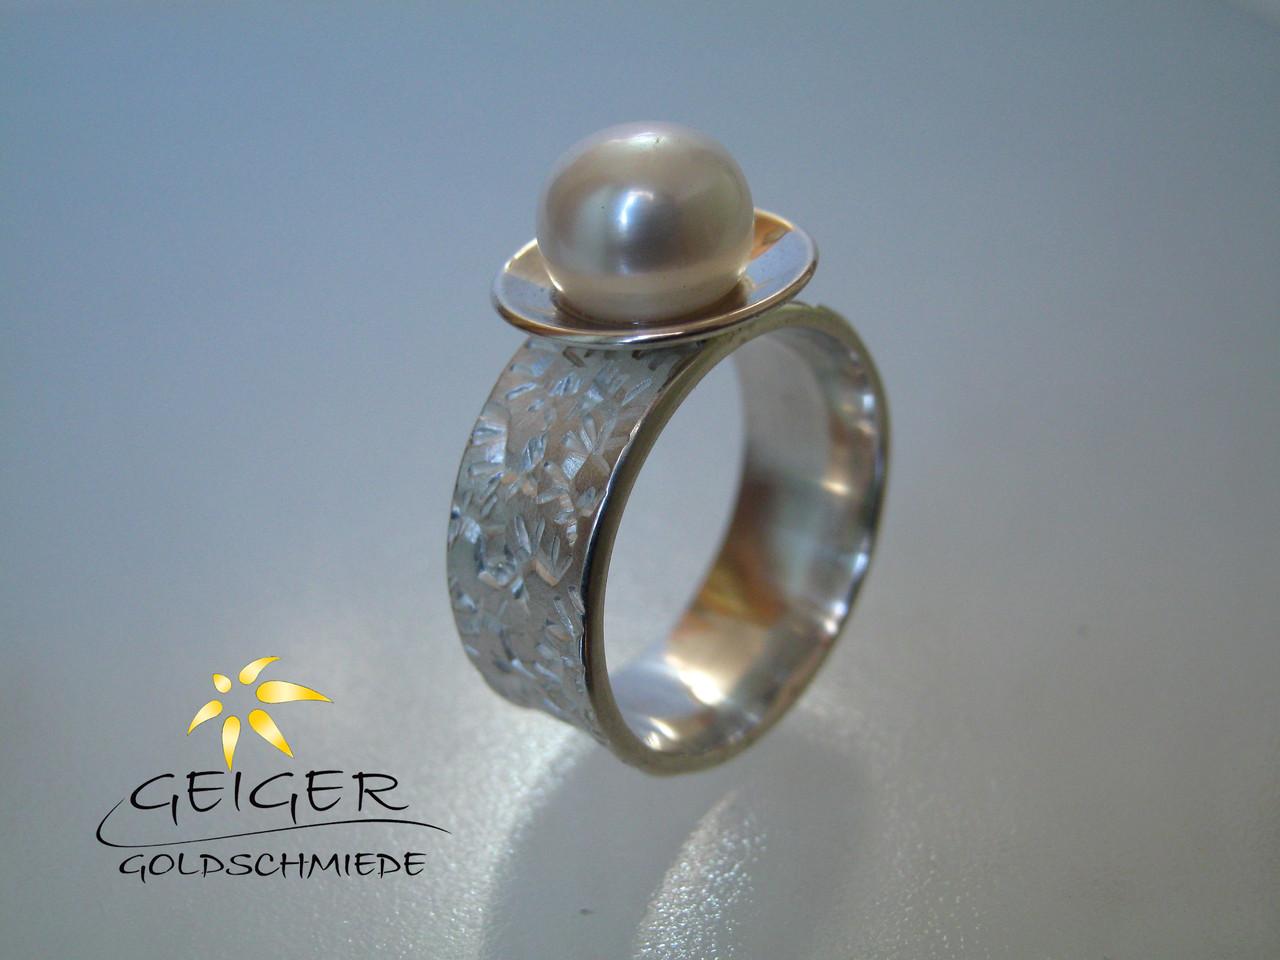 Geiger Goldschmiede Mainz Silberring mit Perle Goldschmiedekunst in formvollendung